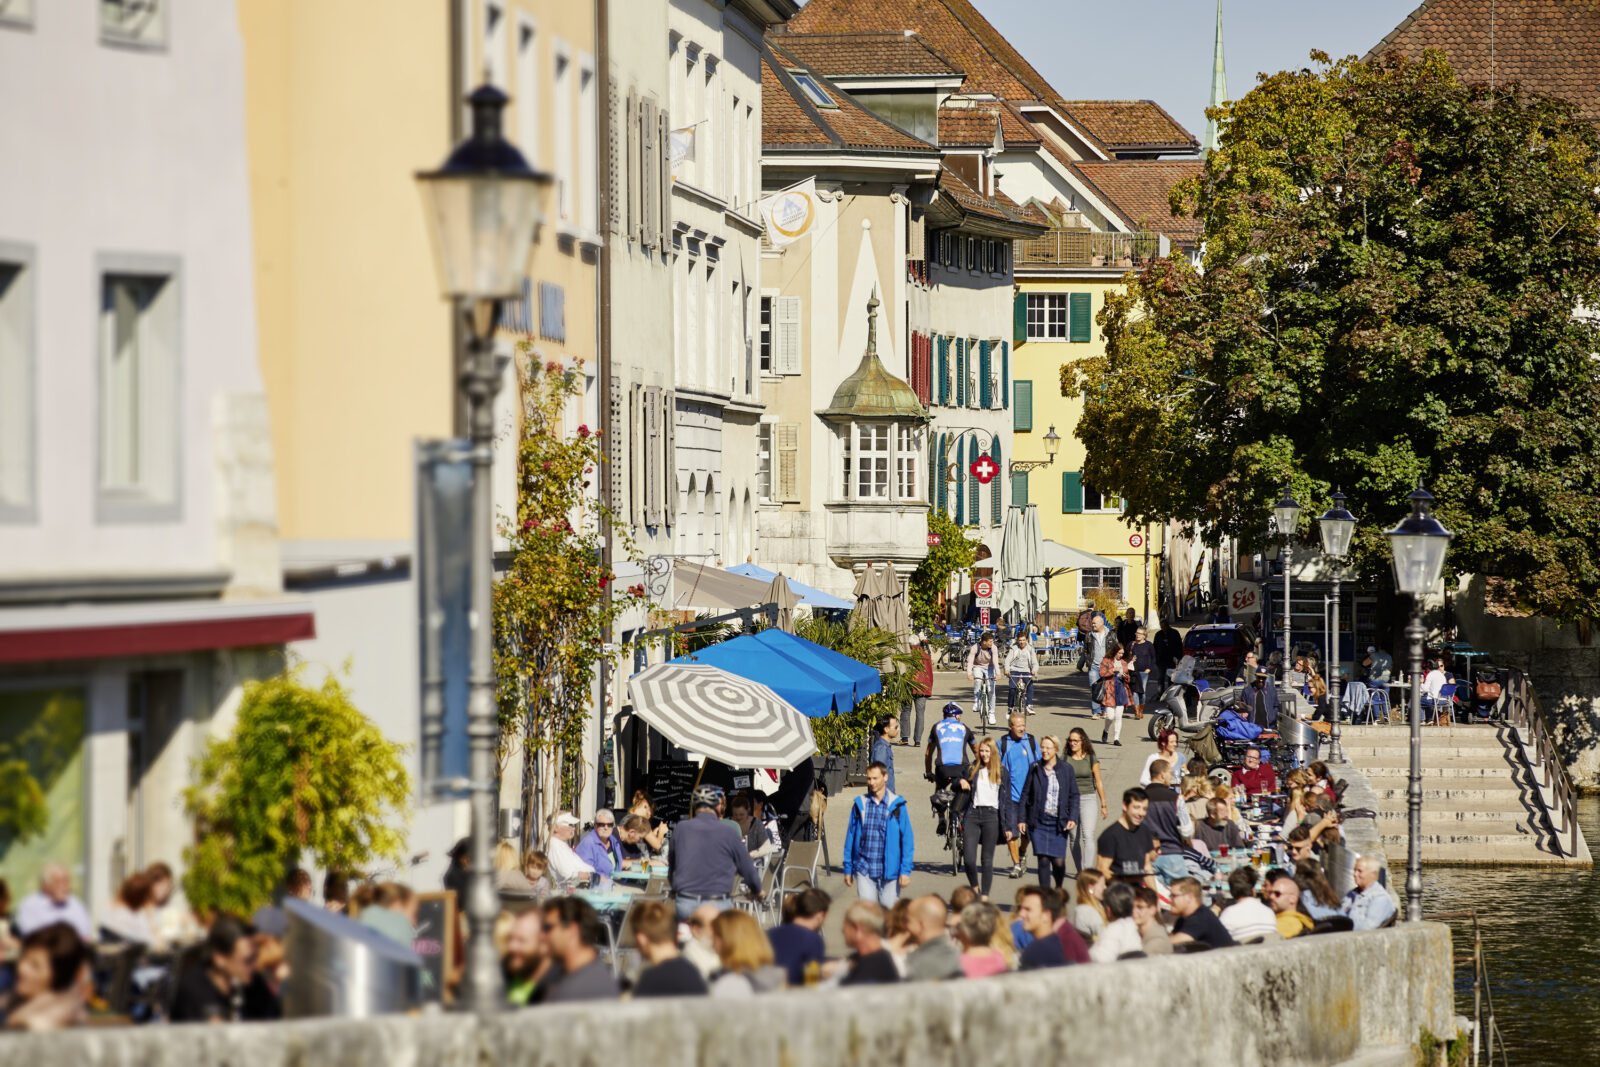 Aare Riviera Landhausqaui 1 Solothurn Tourismus Tino Zurbruegg